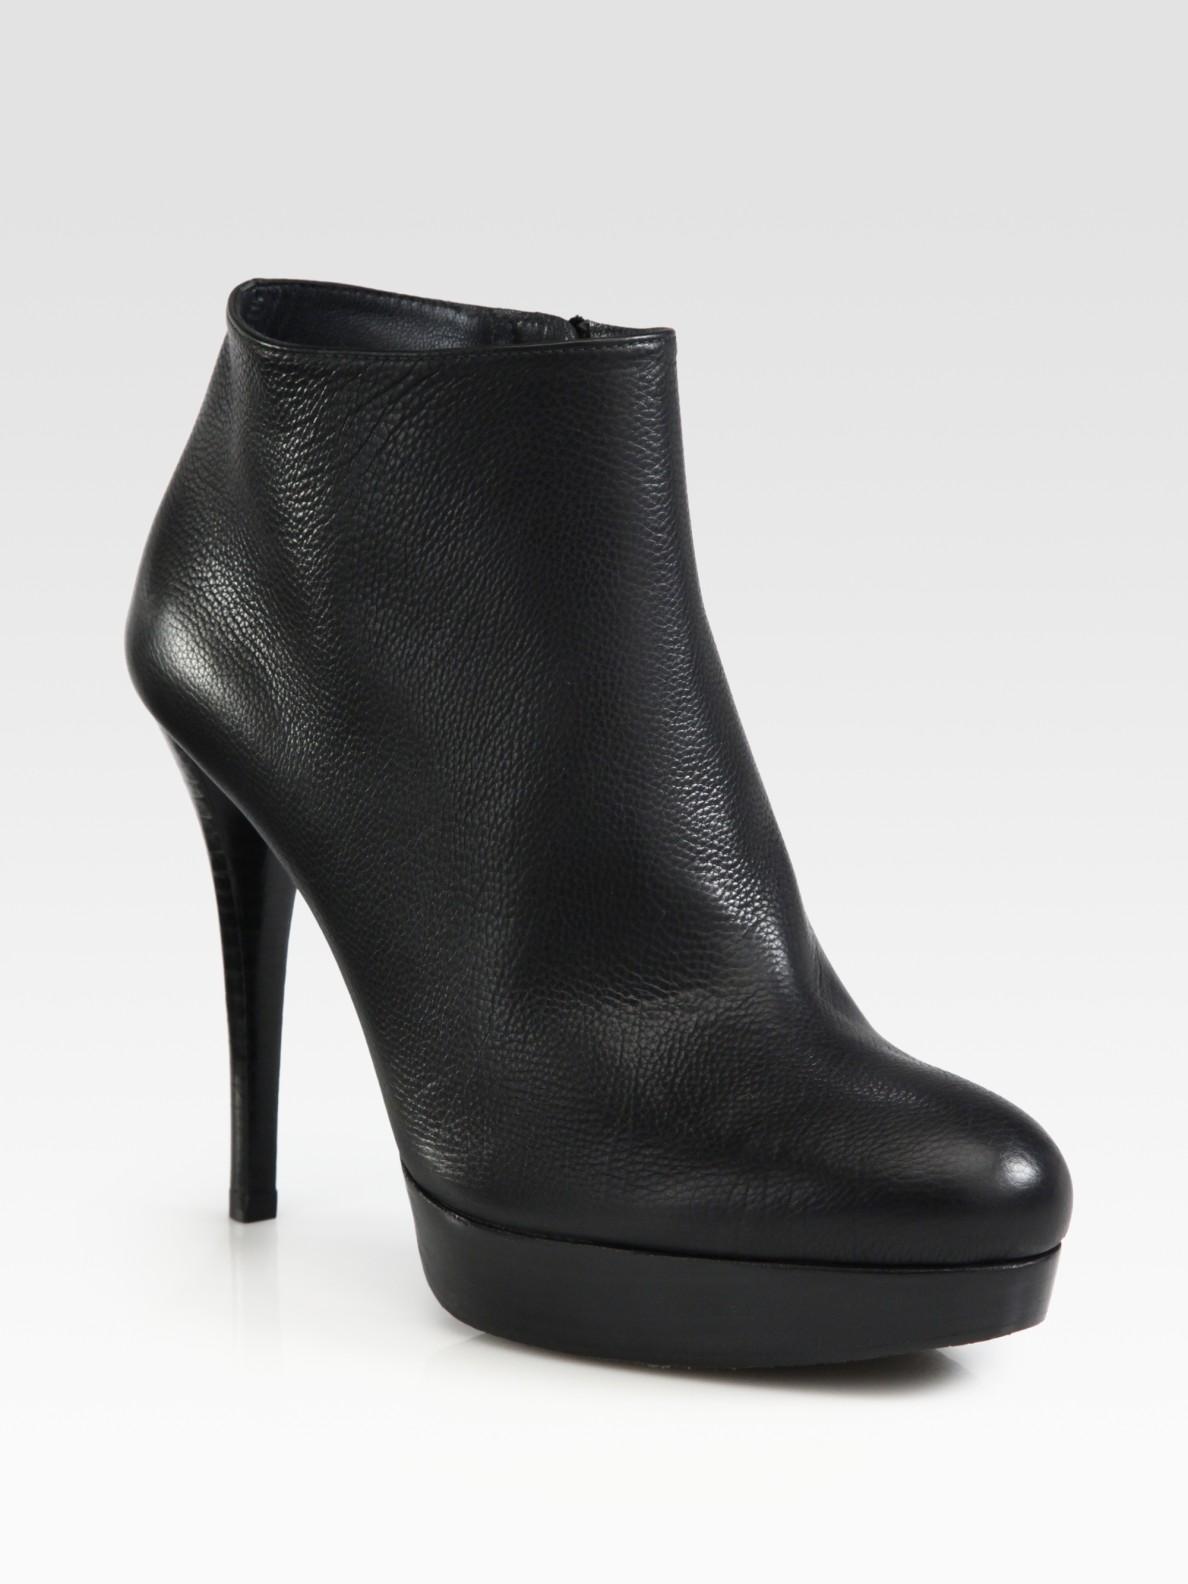 Stuart Weitzman Leather Ankle Boots 4qwAy2QW